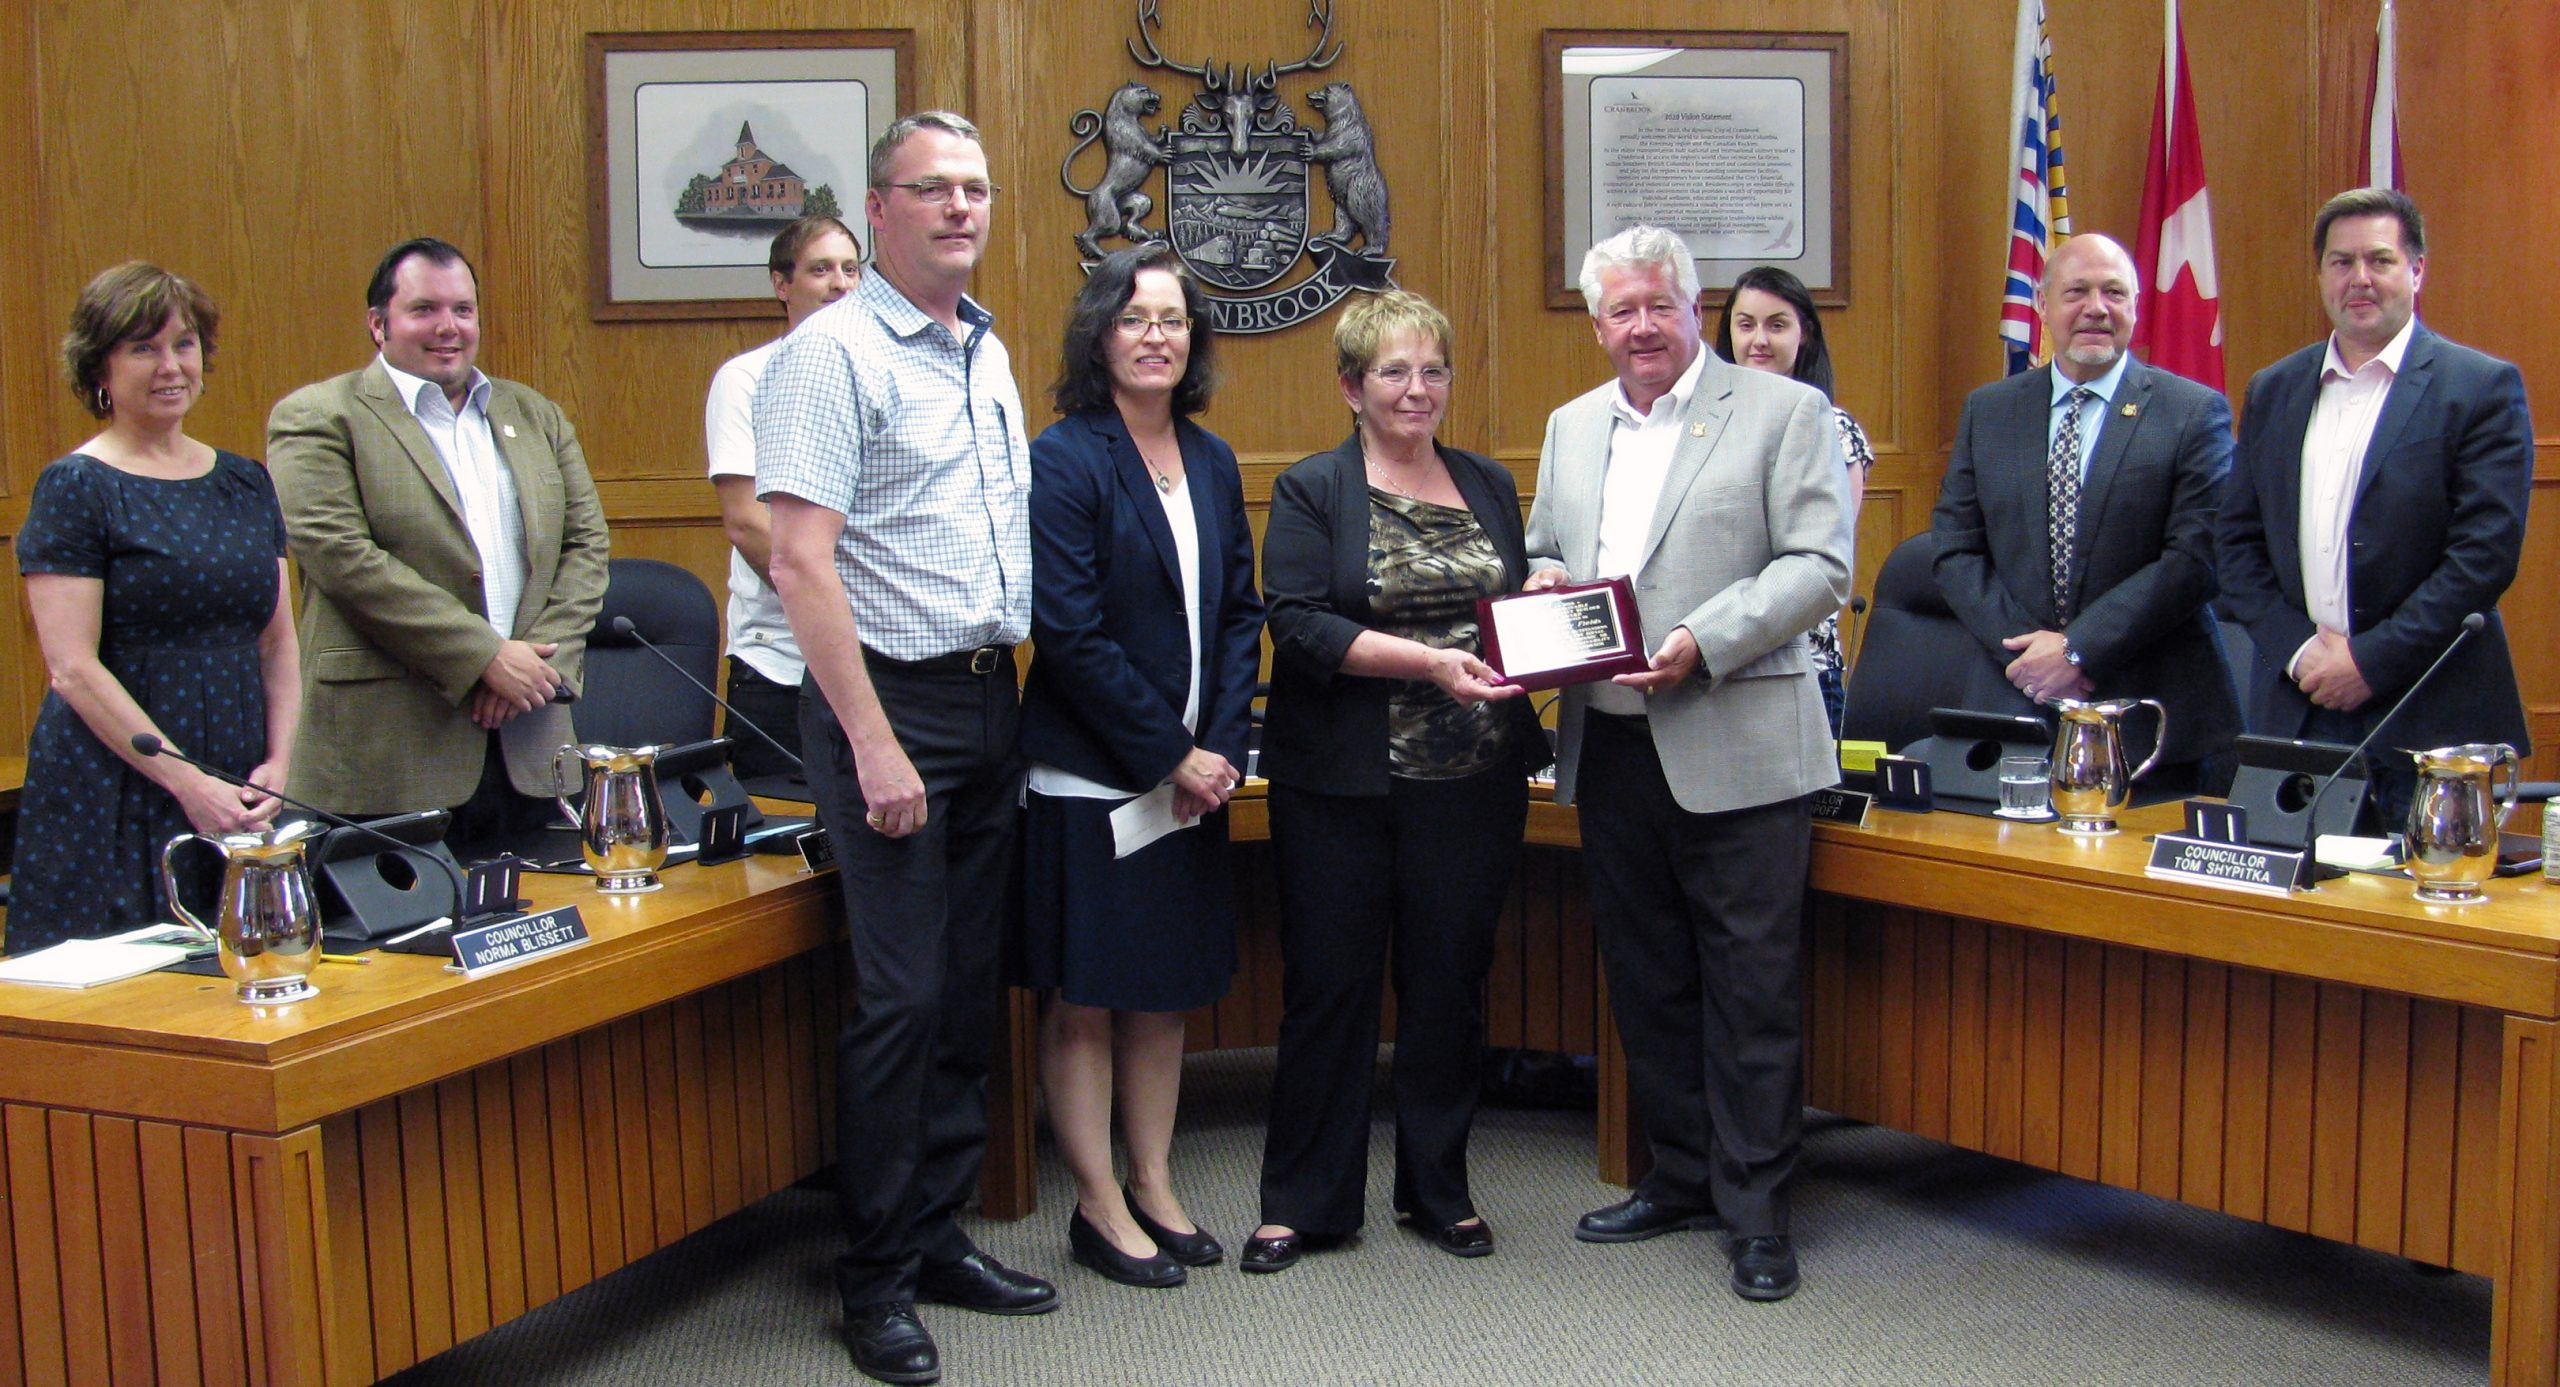 Cranbrook recognizes Sustainable Community Builder for 2016